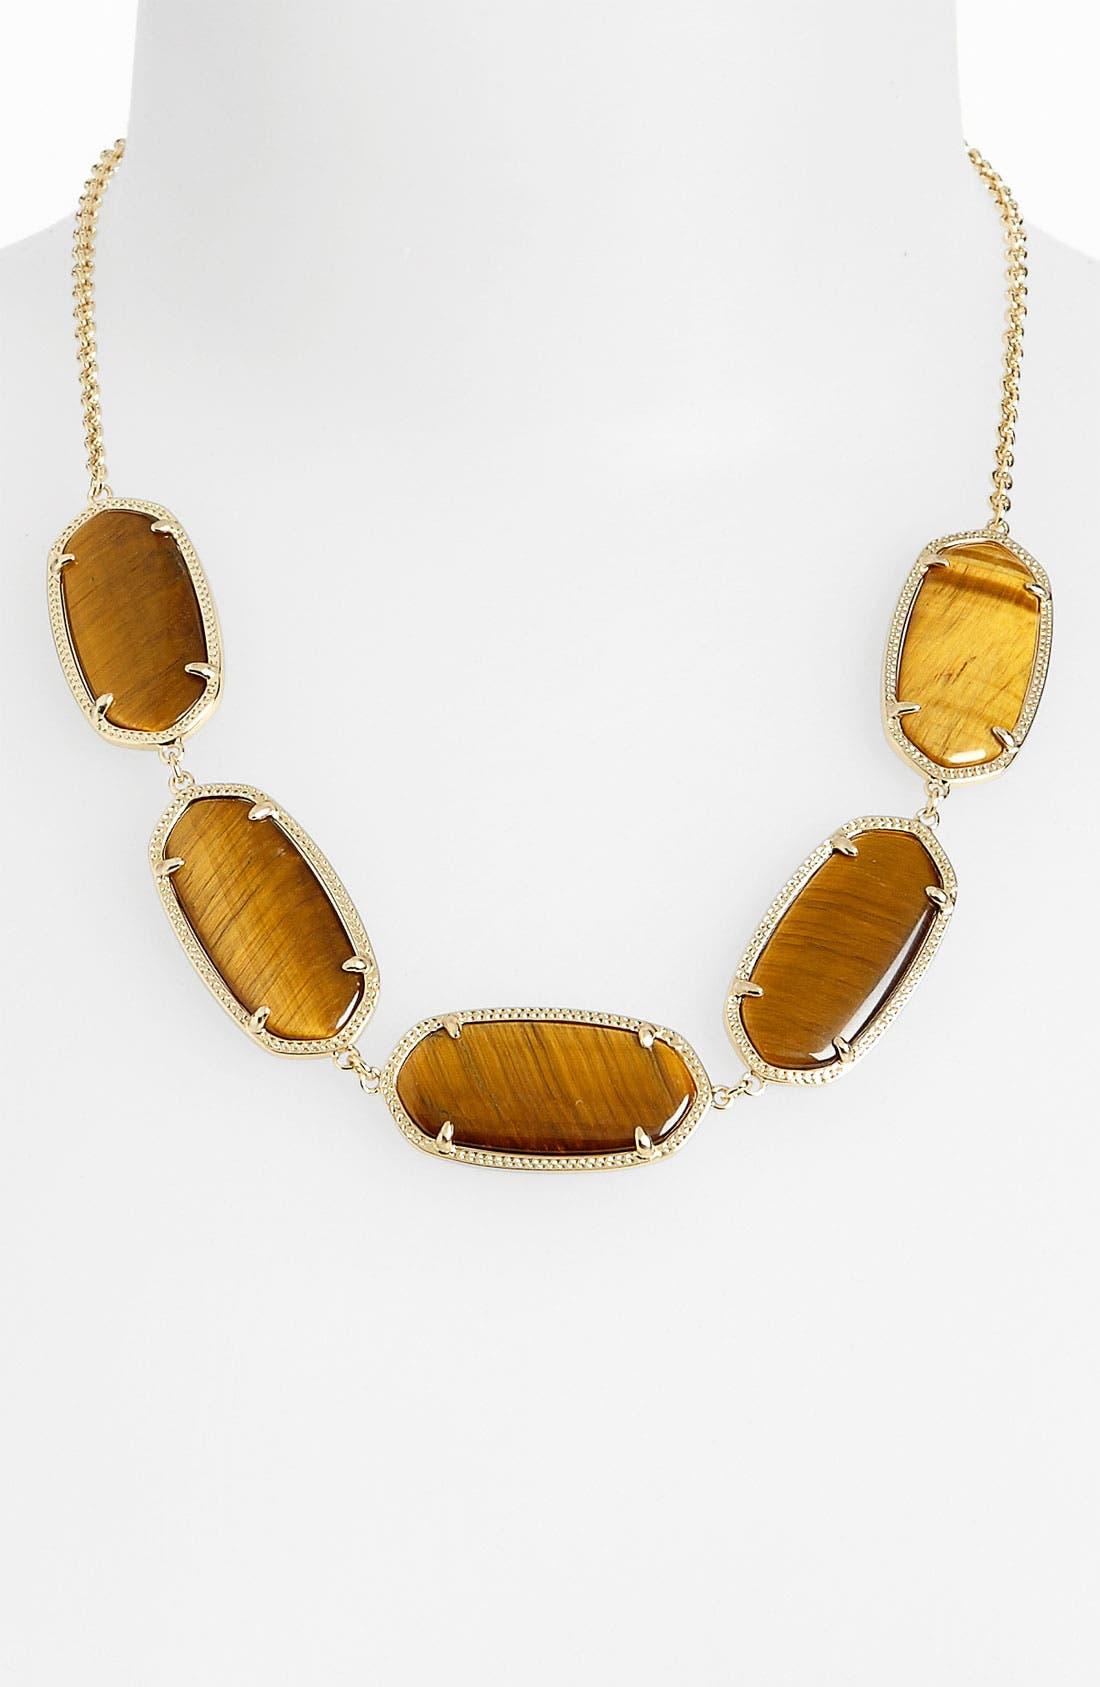 Alternate Image 1 Selected - Kendra Scott 'Aimee' Collar Necklace